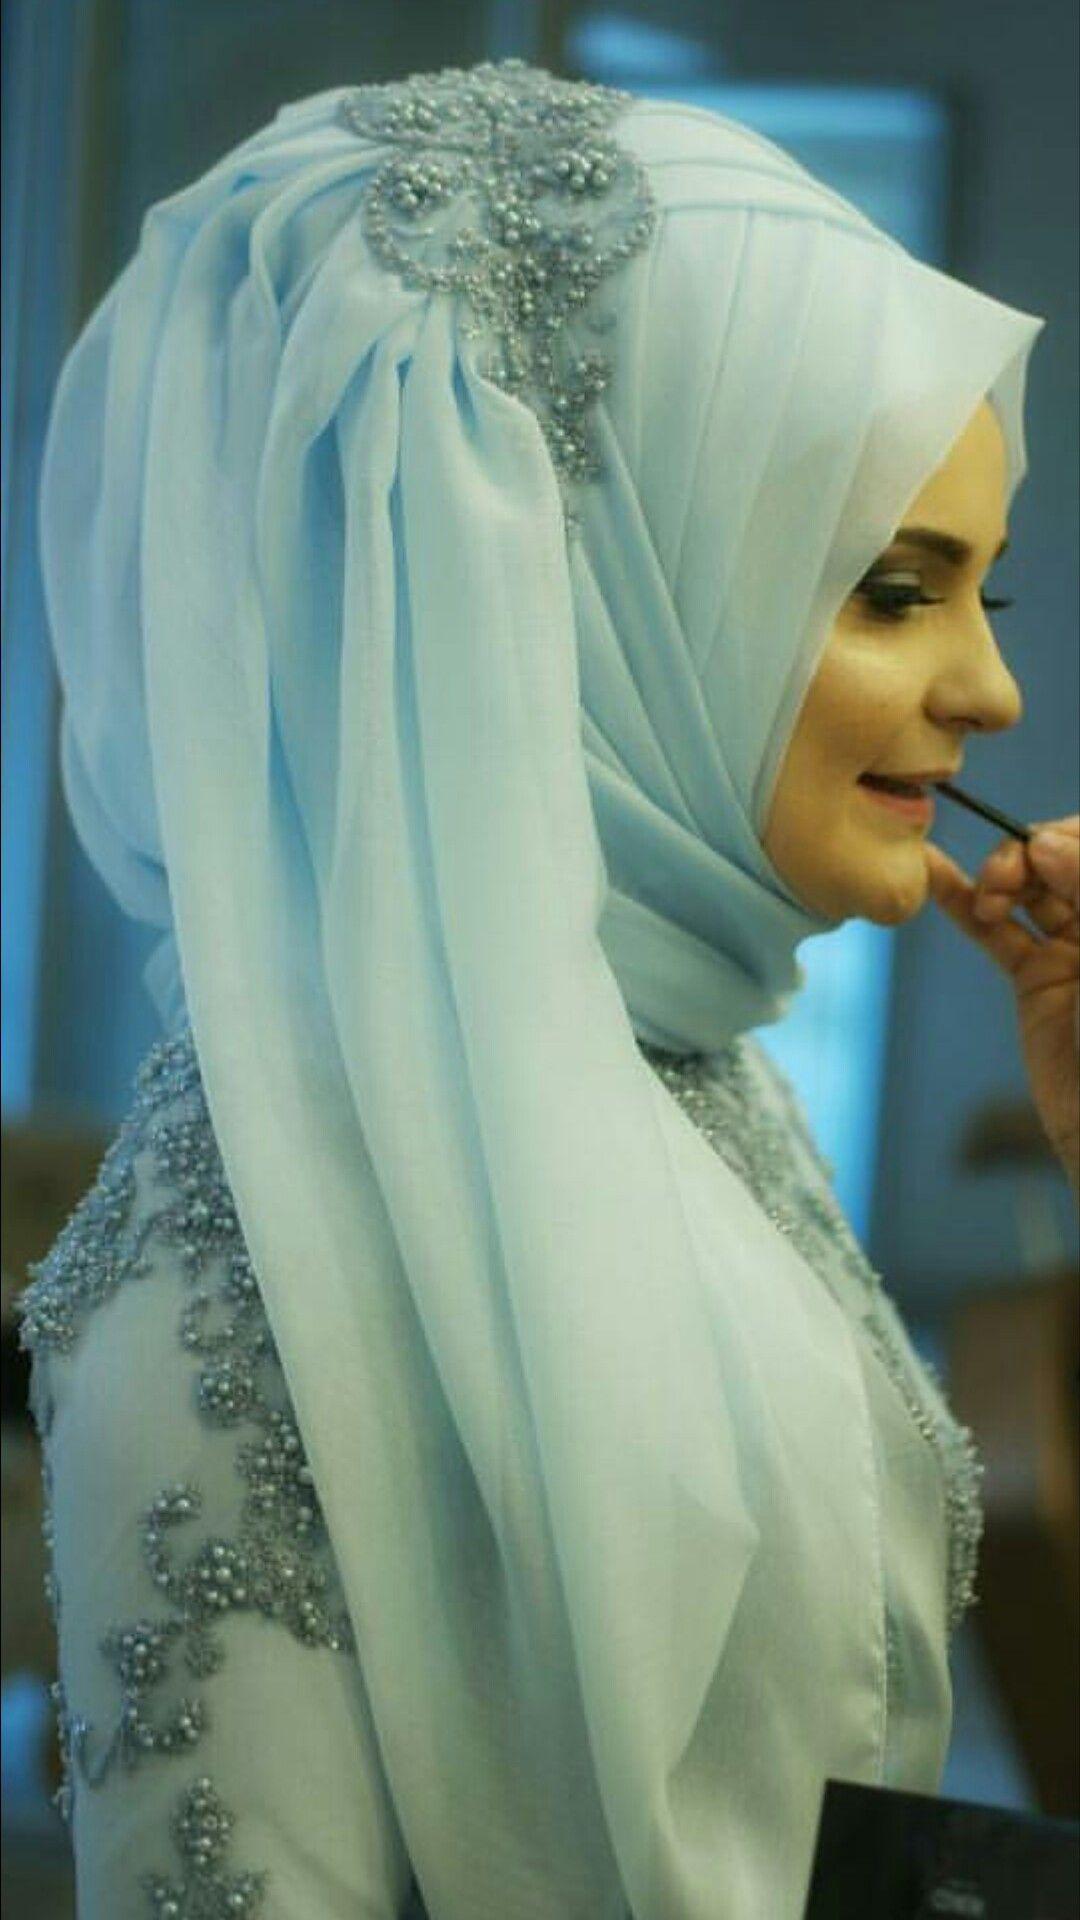 Pin by Rumeysa on Türban modelleri | Pinterest | Wedding hijab ...